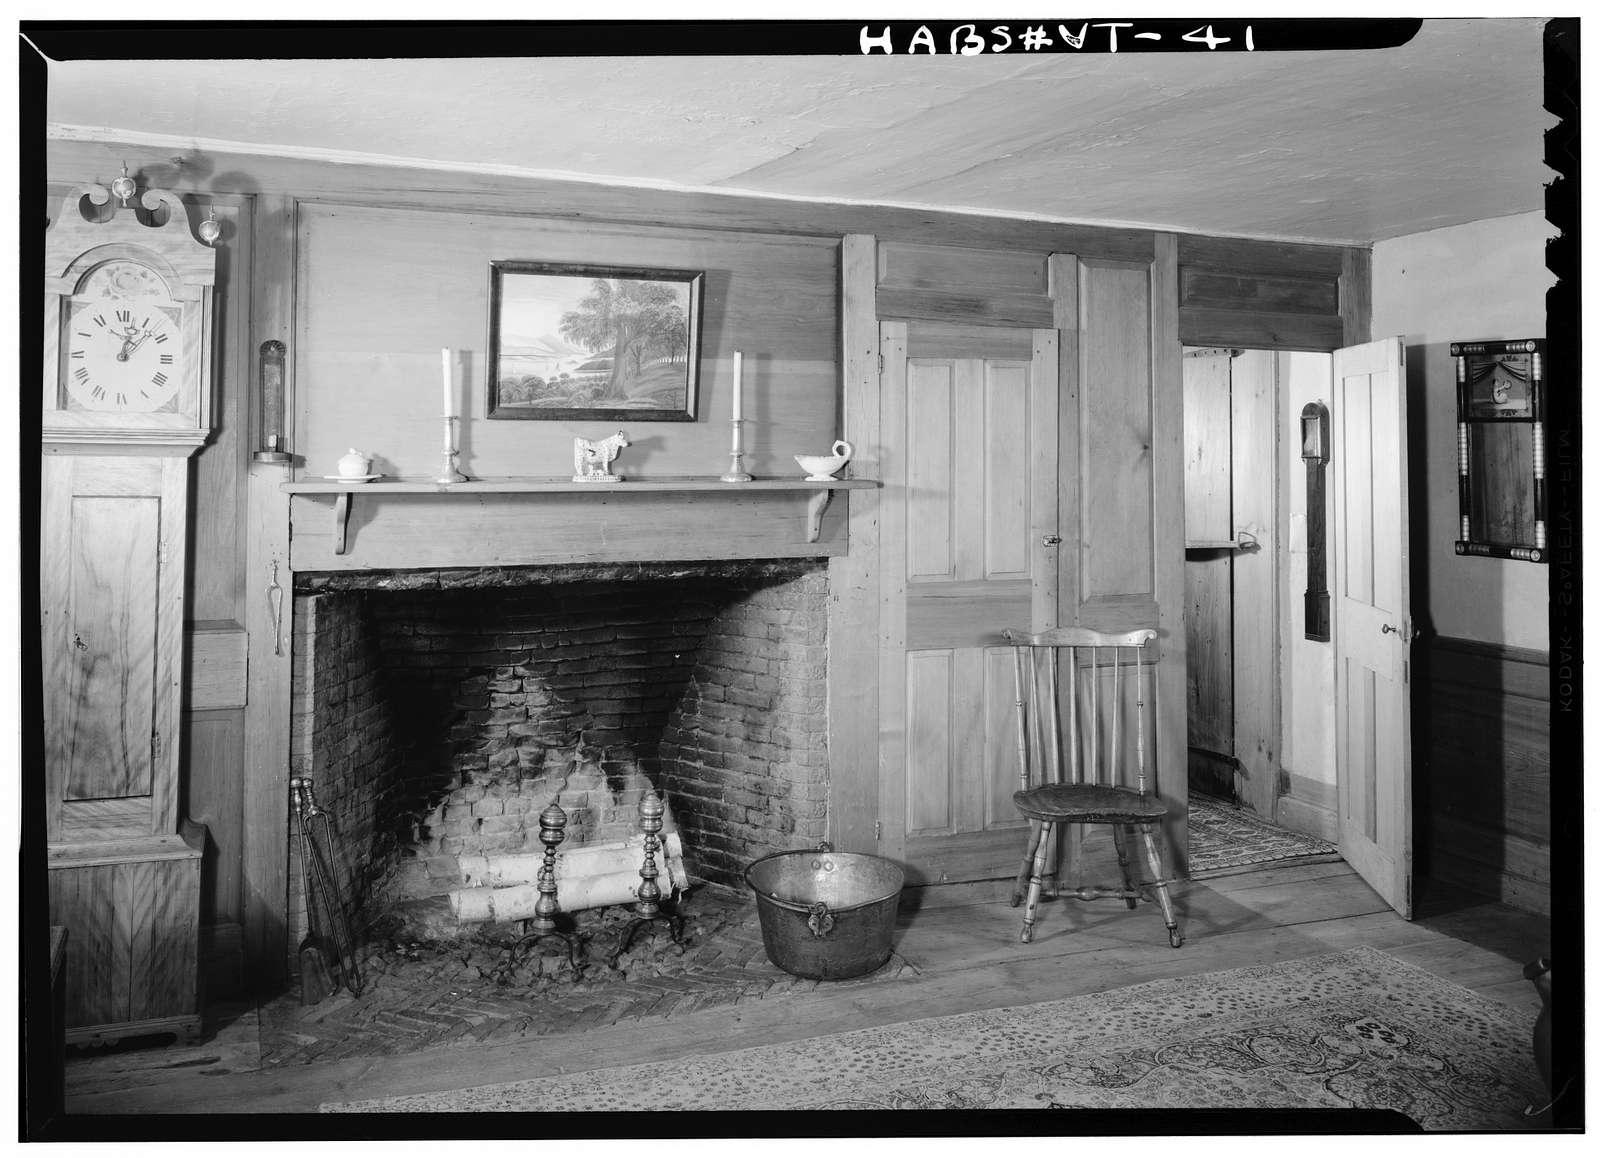 David Pulsifer Inn, Route 103, Rockingham, Windham County, VT